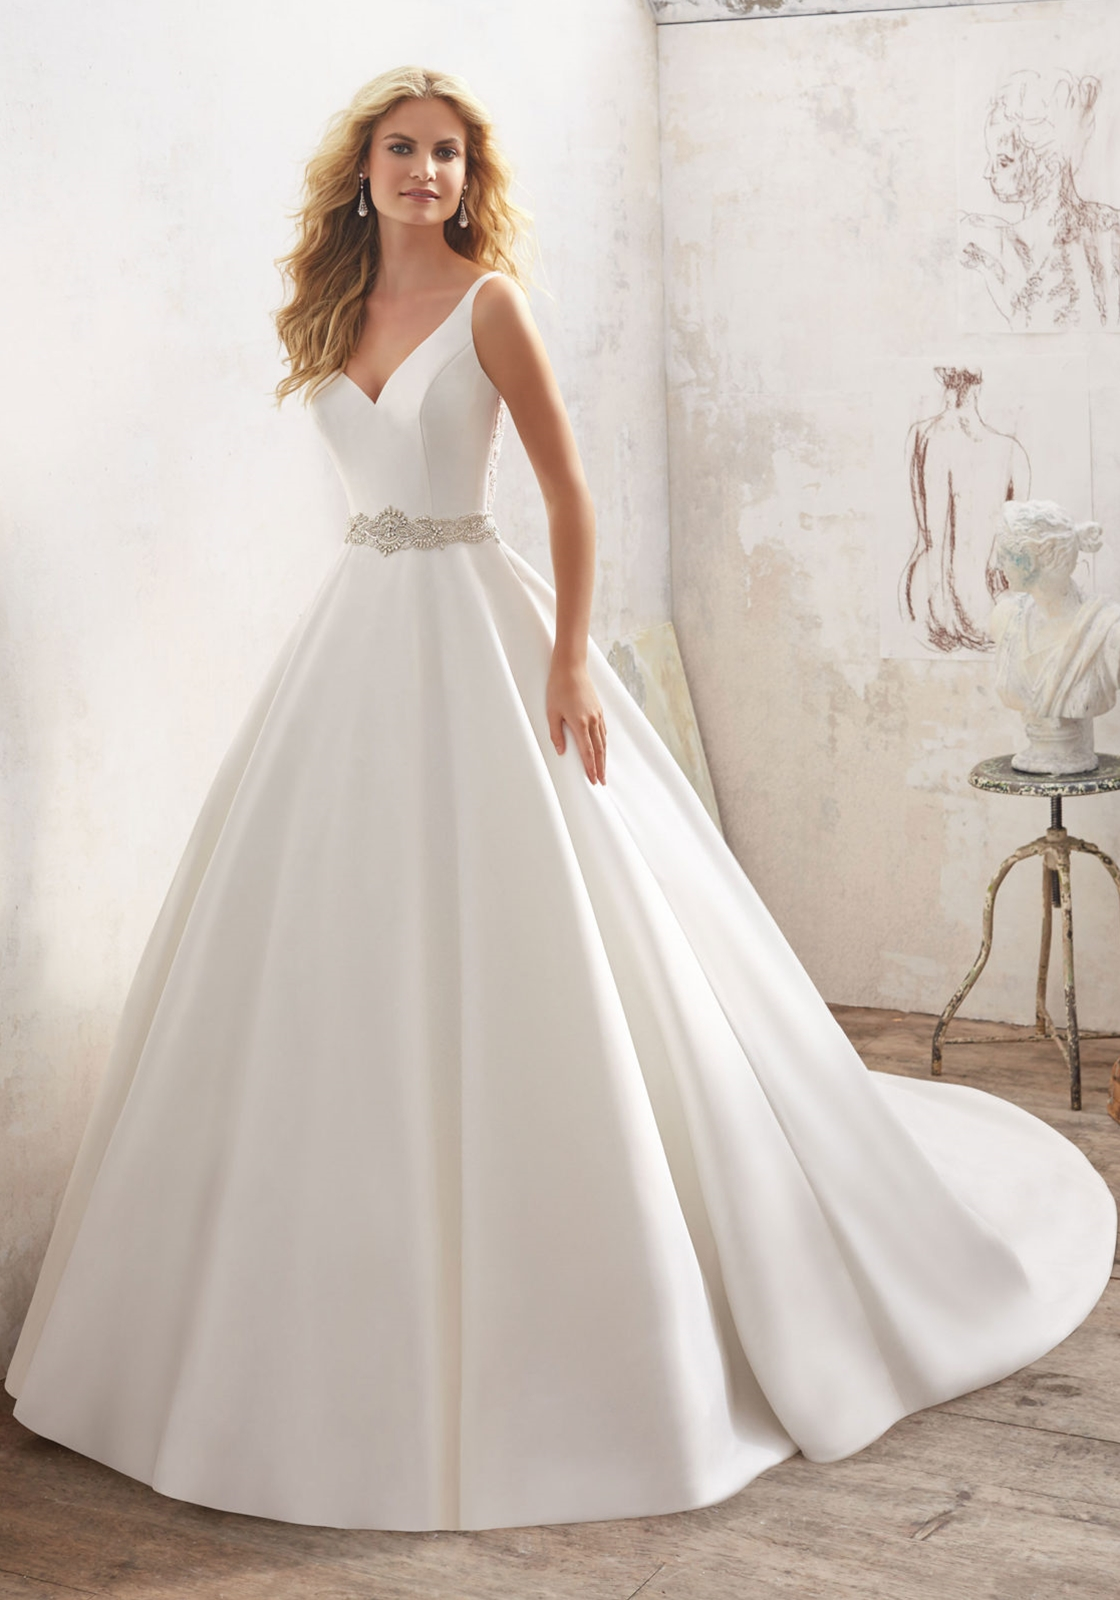 Mori lee wedding dresses wedding designer bridal gowns mori lee wedding dresses ombrellifo Images